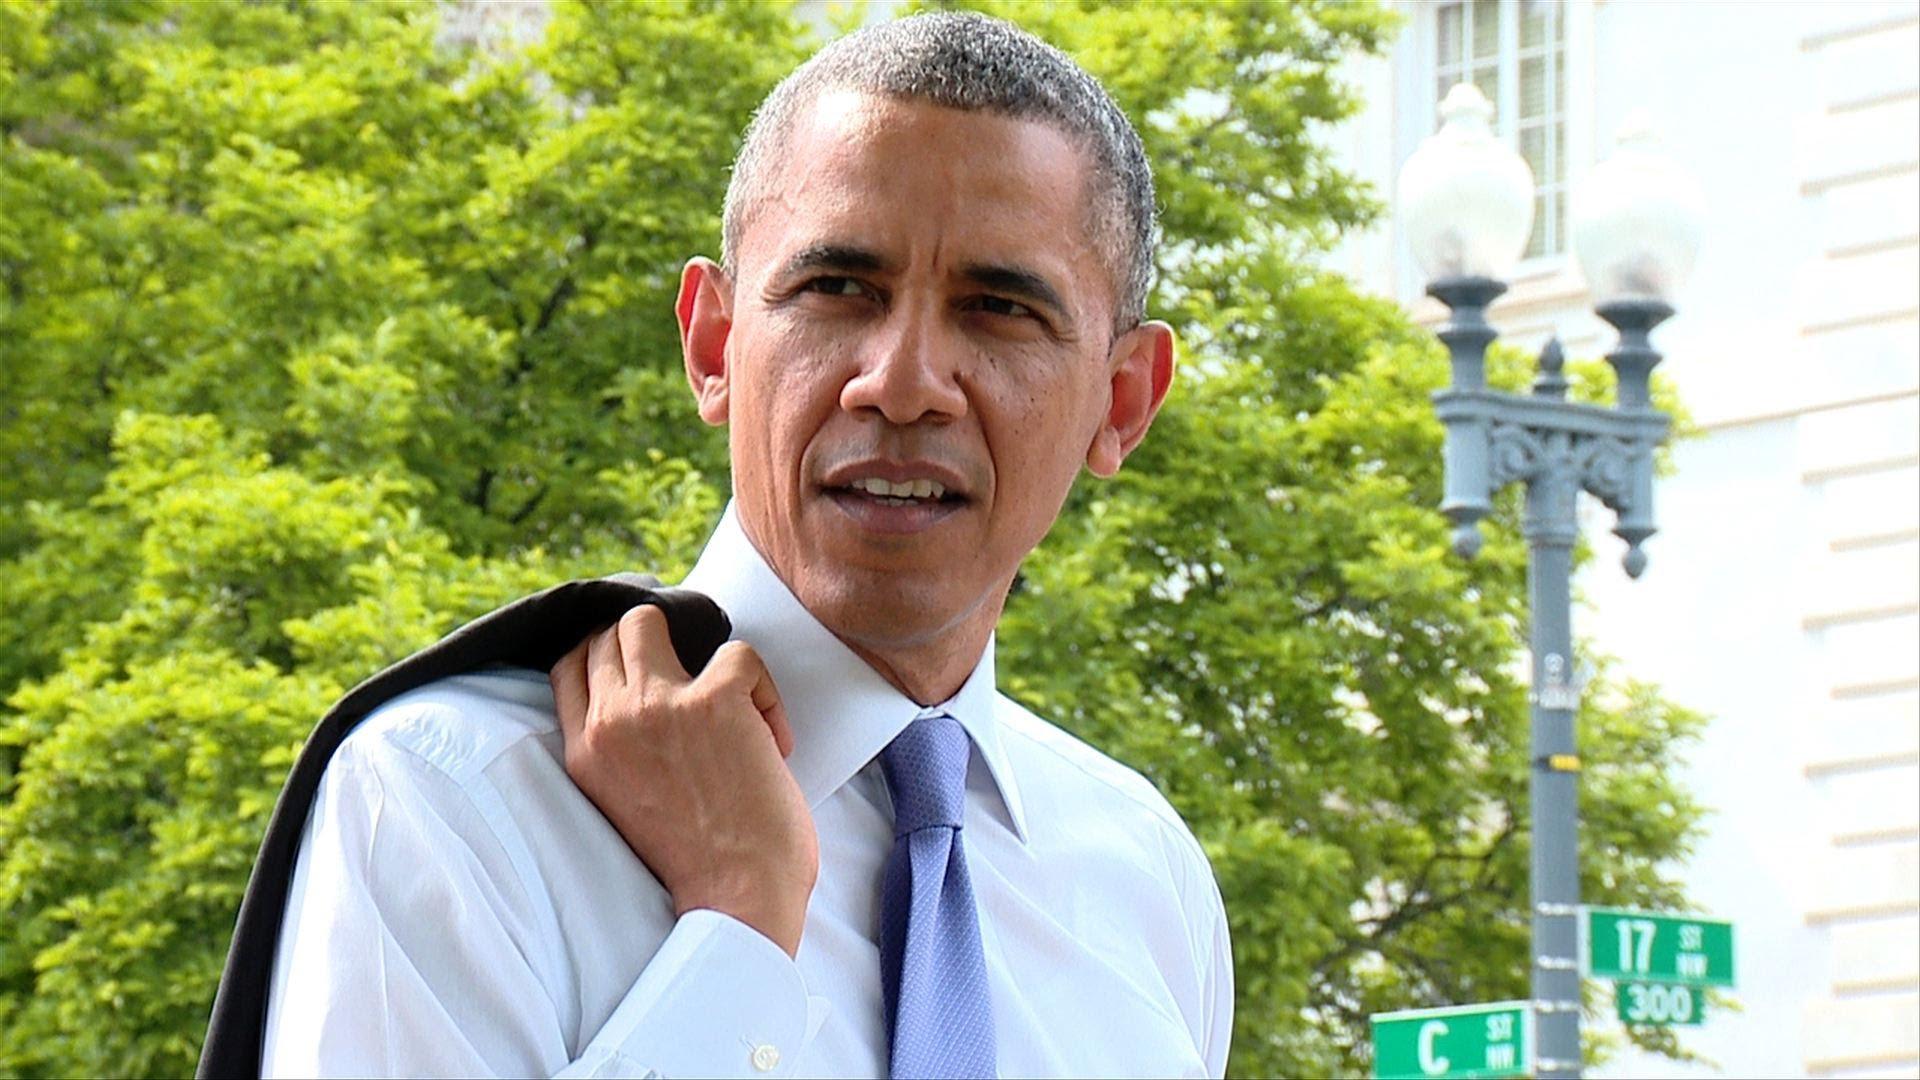 President Barack Obama Takes A Surprise Springtime Walk Around A Washington D.C. Neighborhood